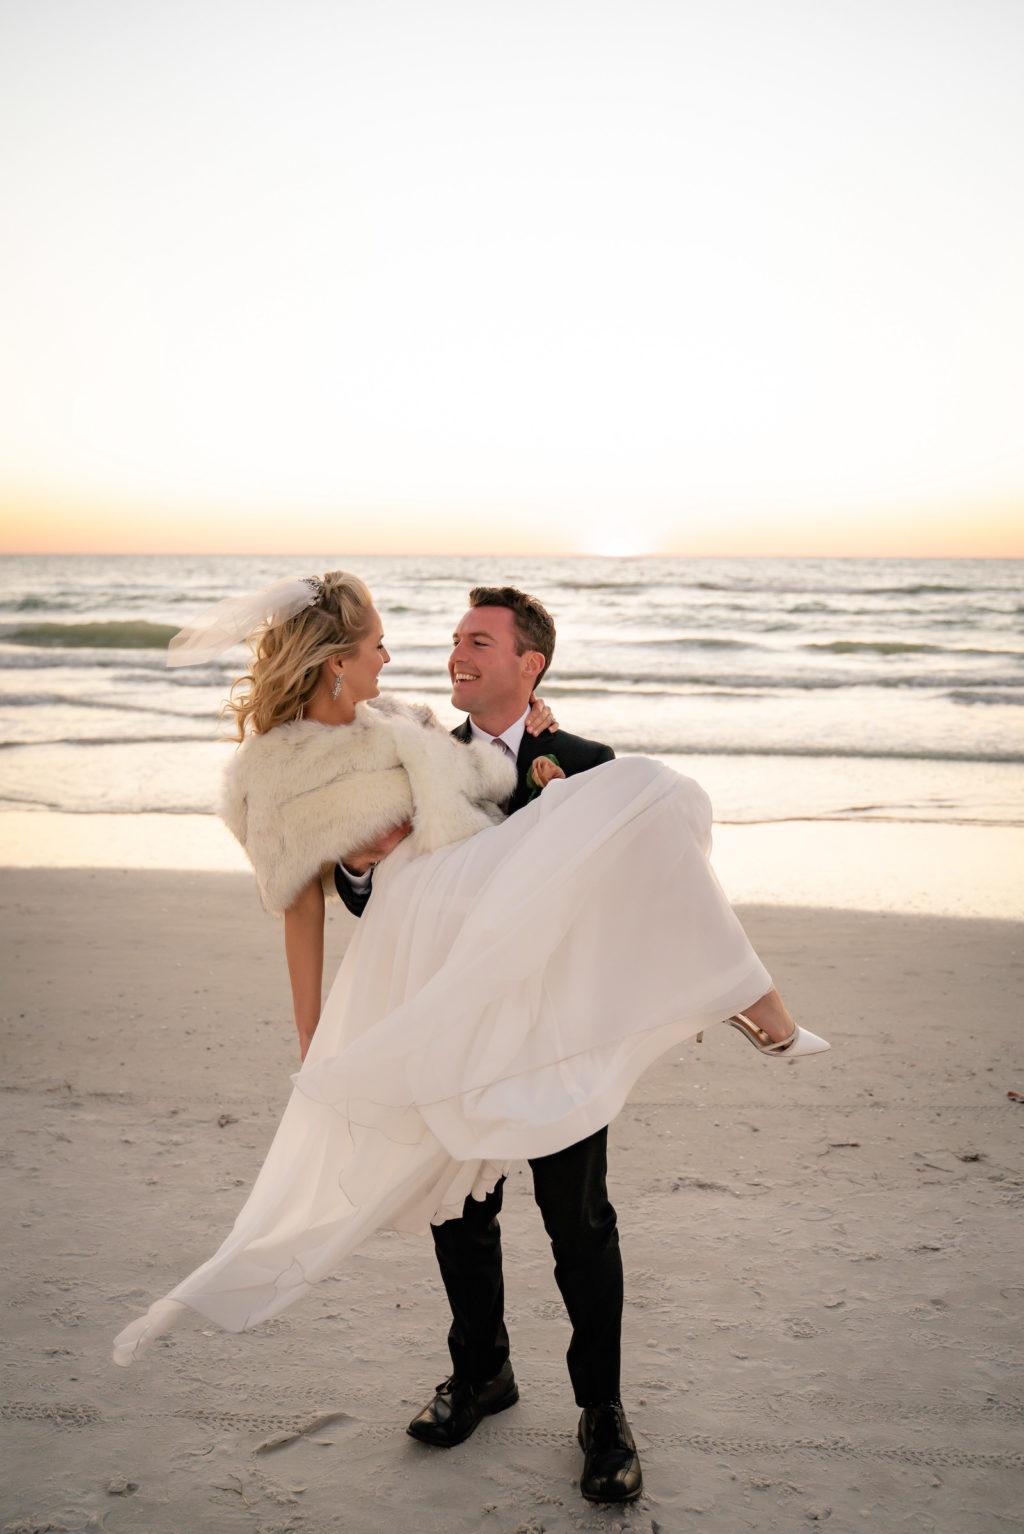 Groom Carrying Bride Wearing White Fur Shawl on Beach | Tampa Bay Wedding Dress Isabel O'Neil Bridal